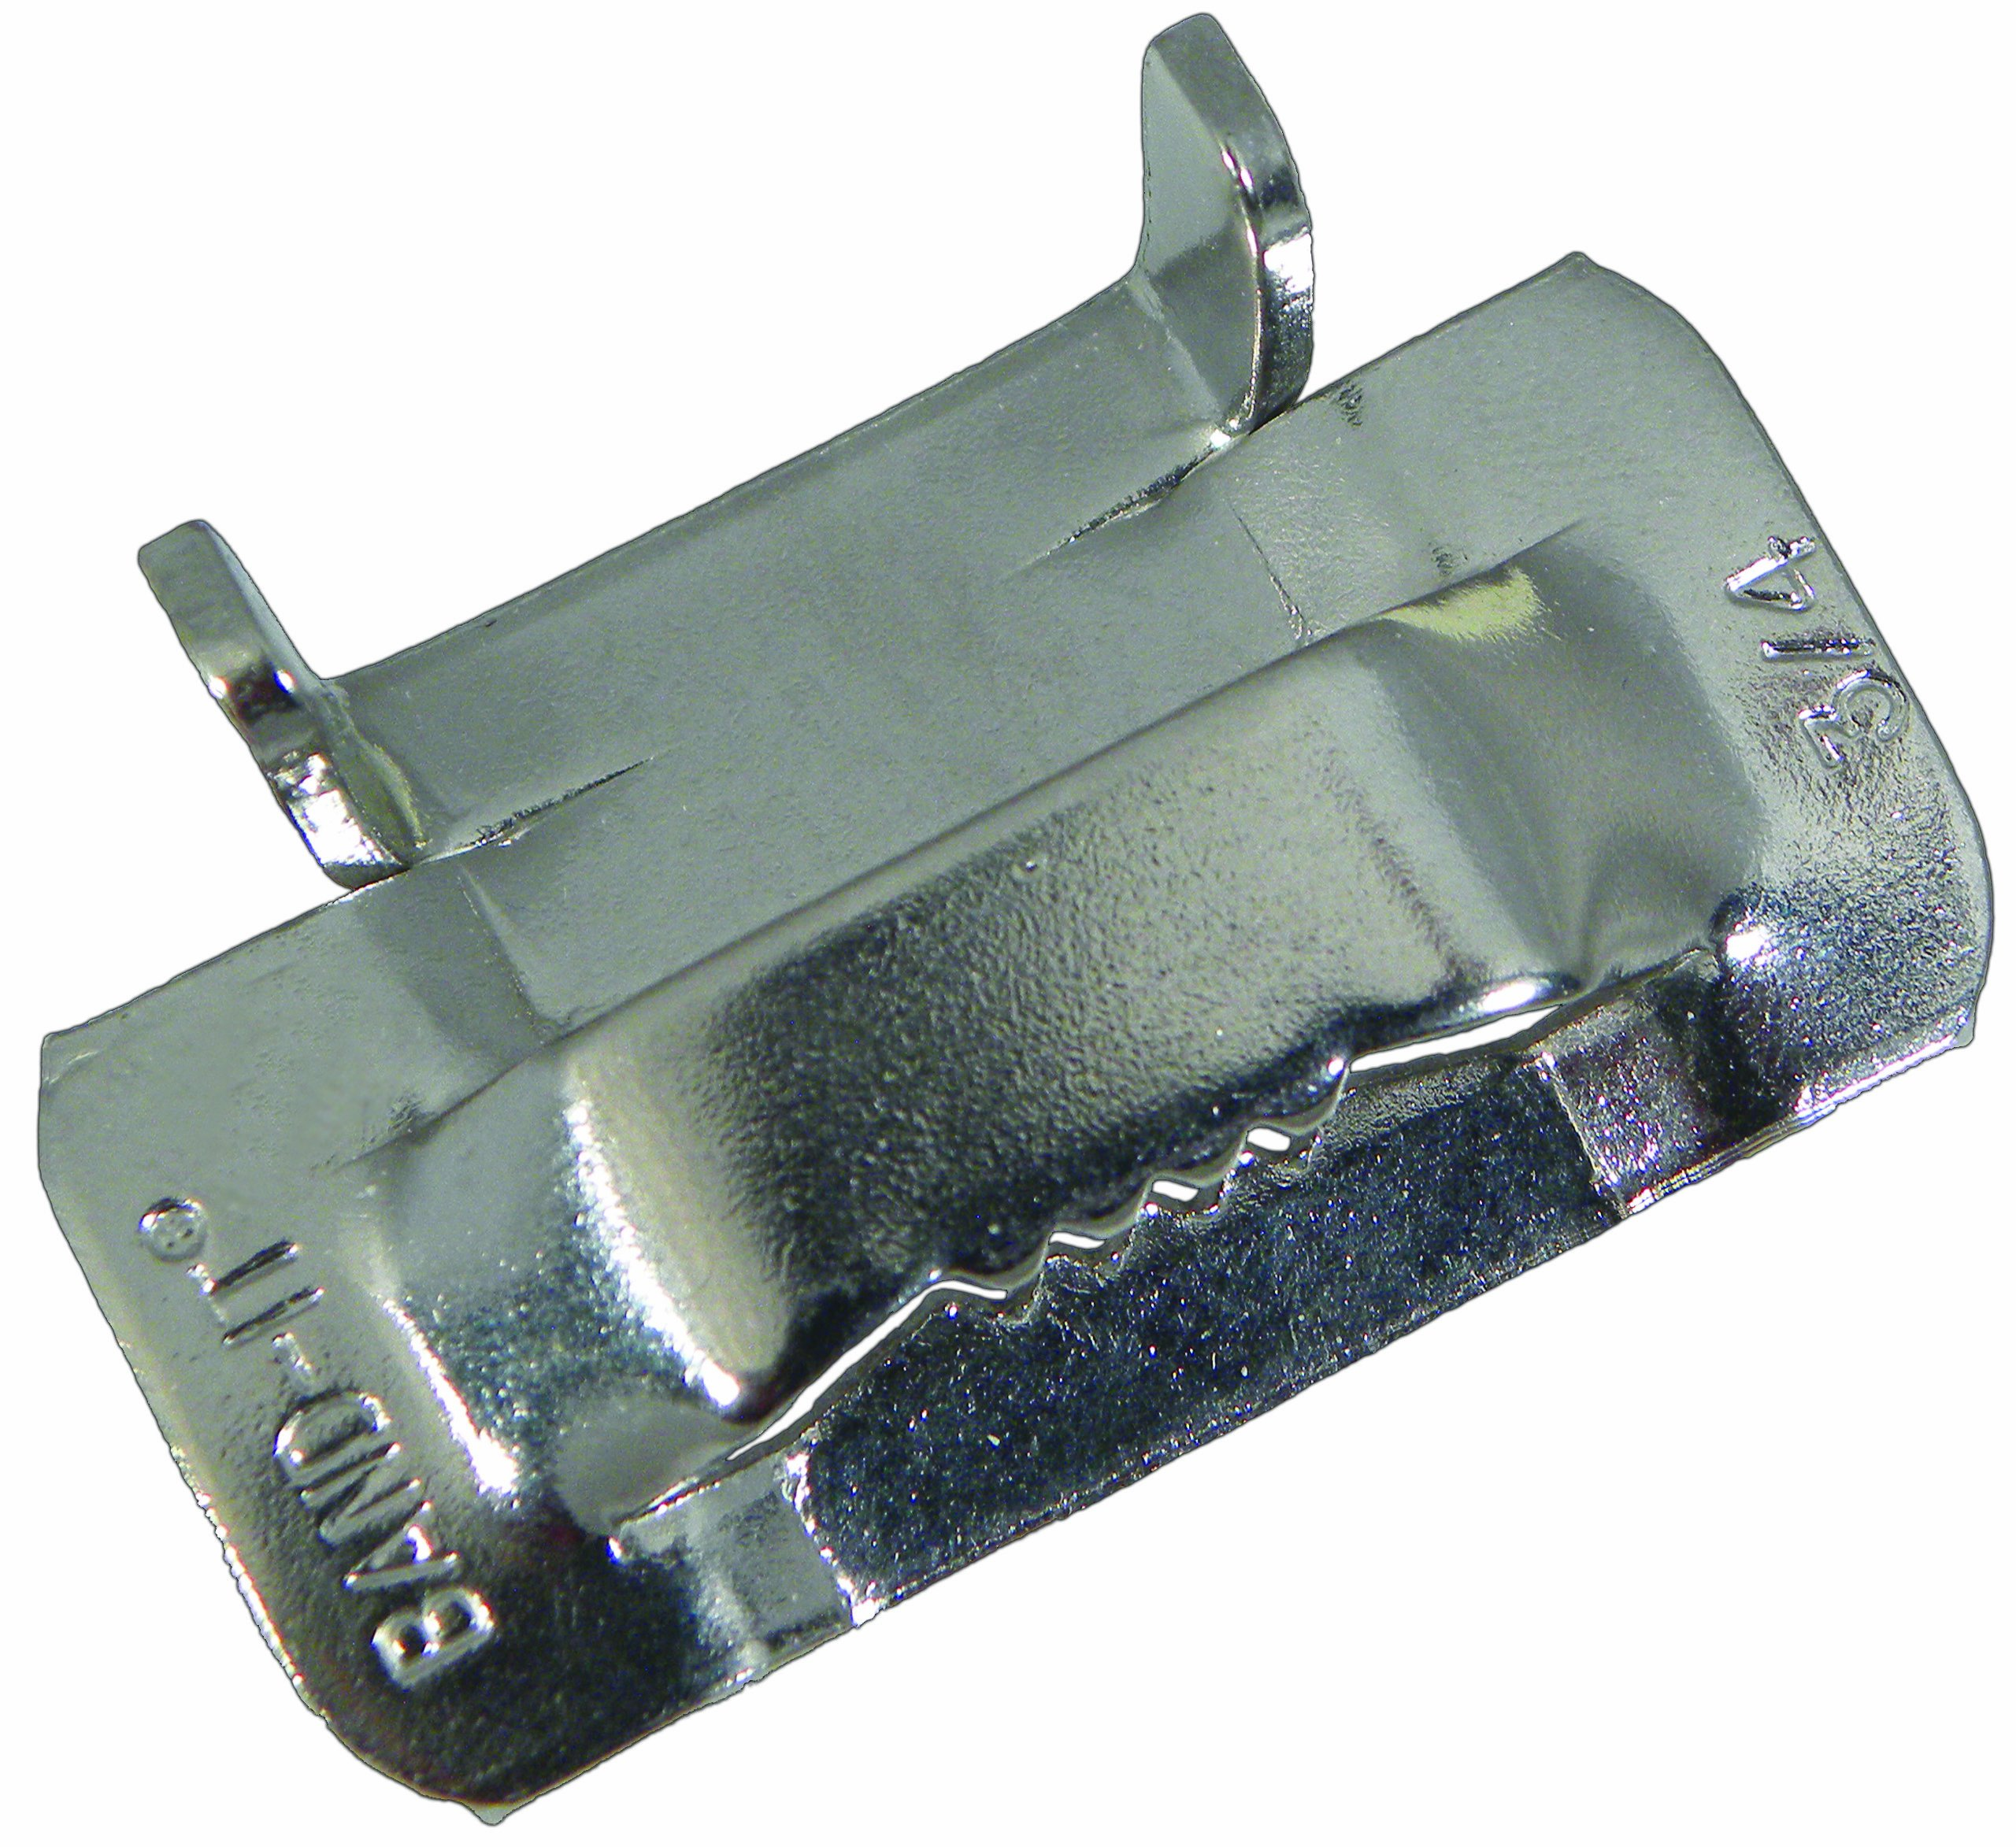 BAND-IT C25699 201/301 Stainless Steel Ear-Lokt Buckle, 3/4'' Width, 100 per Box